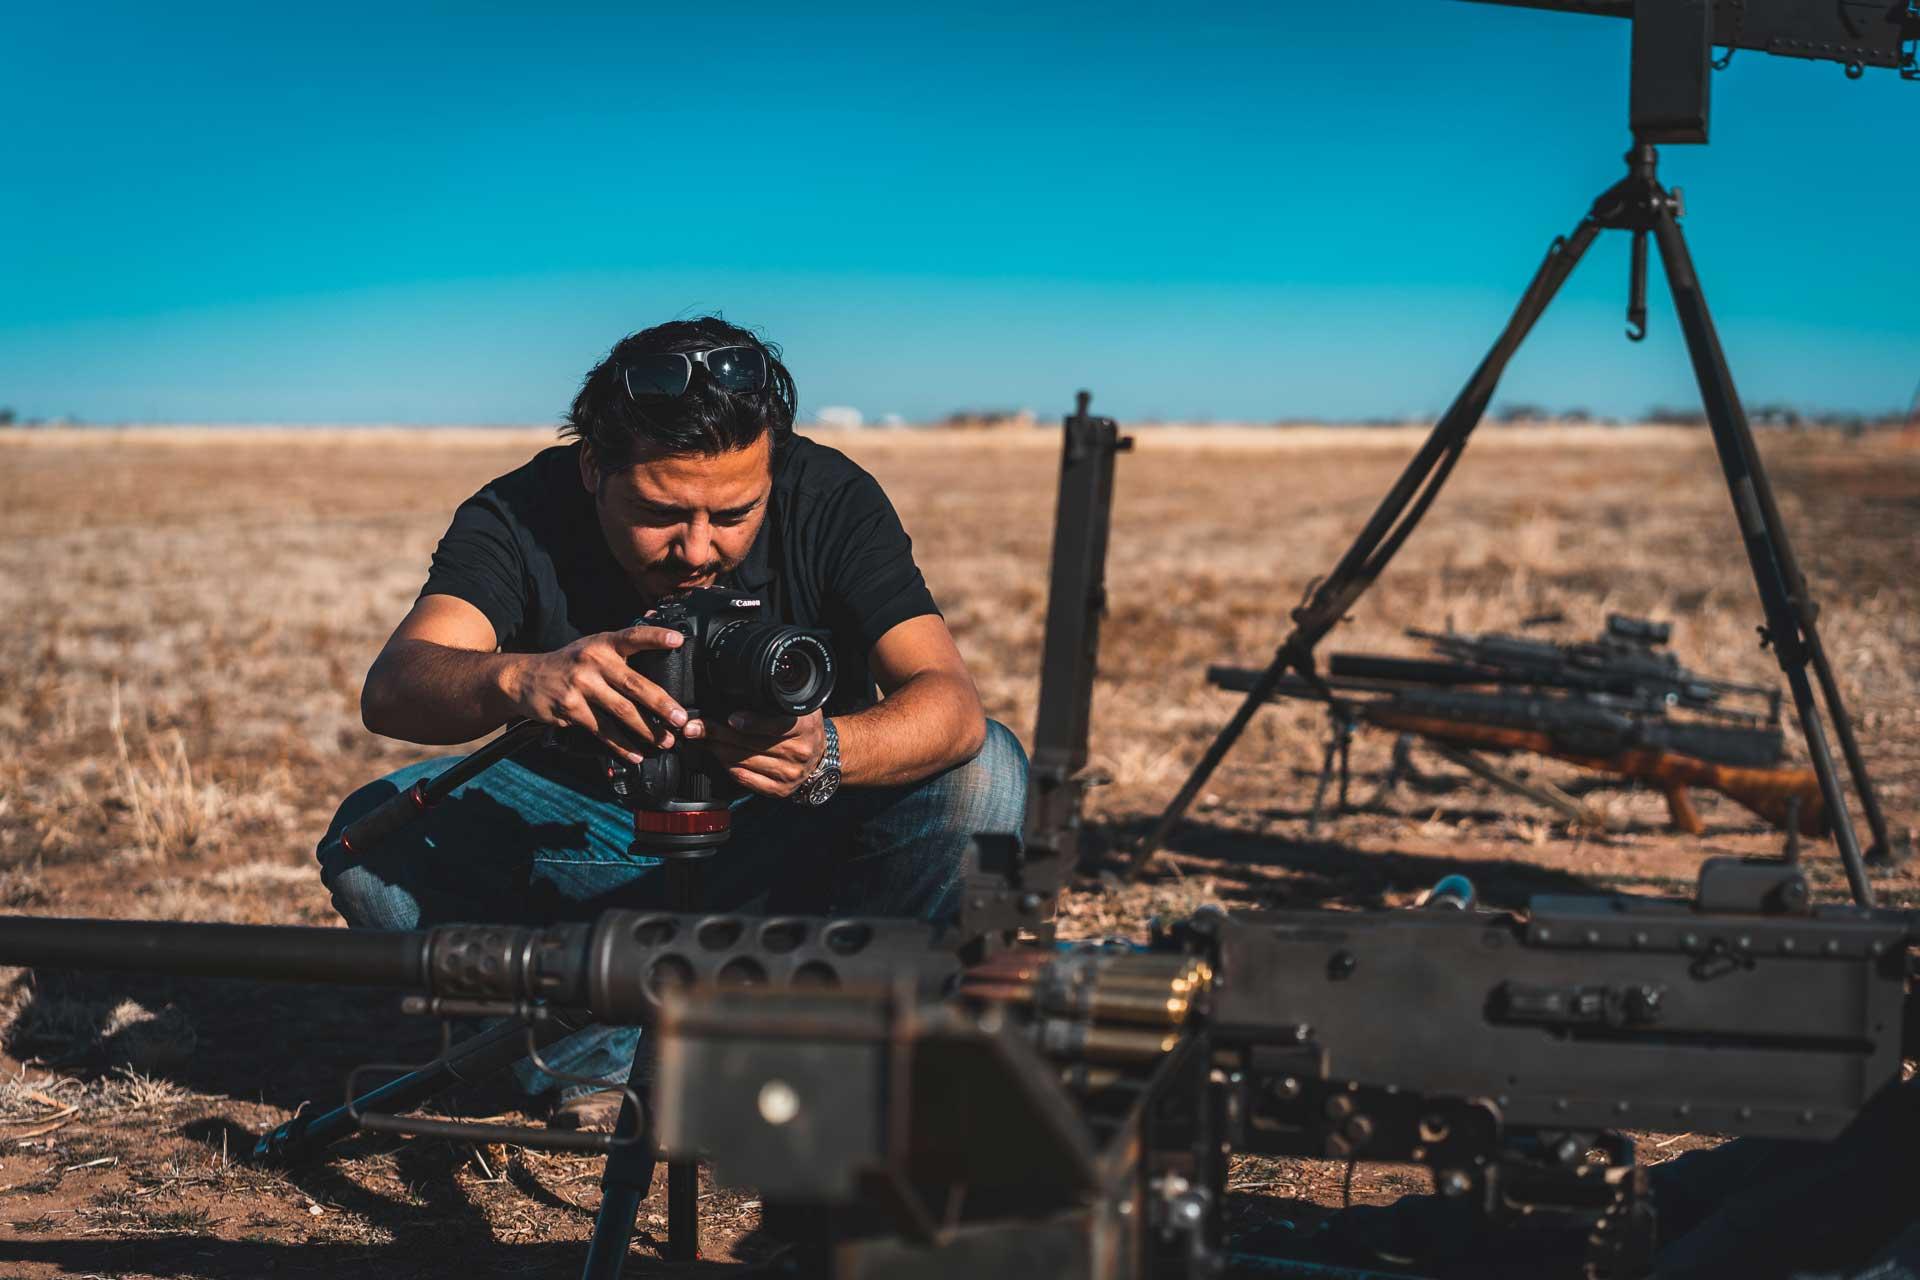 creative_cannon_video_shoot-4